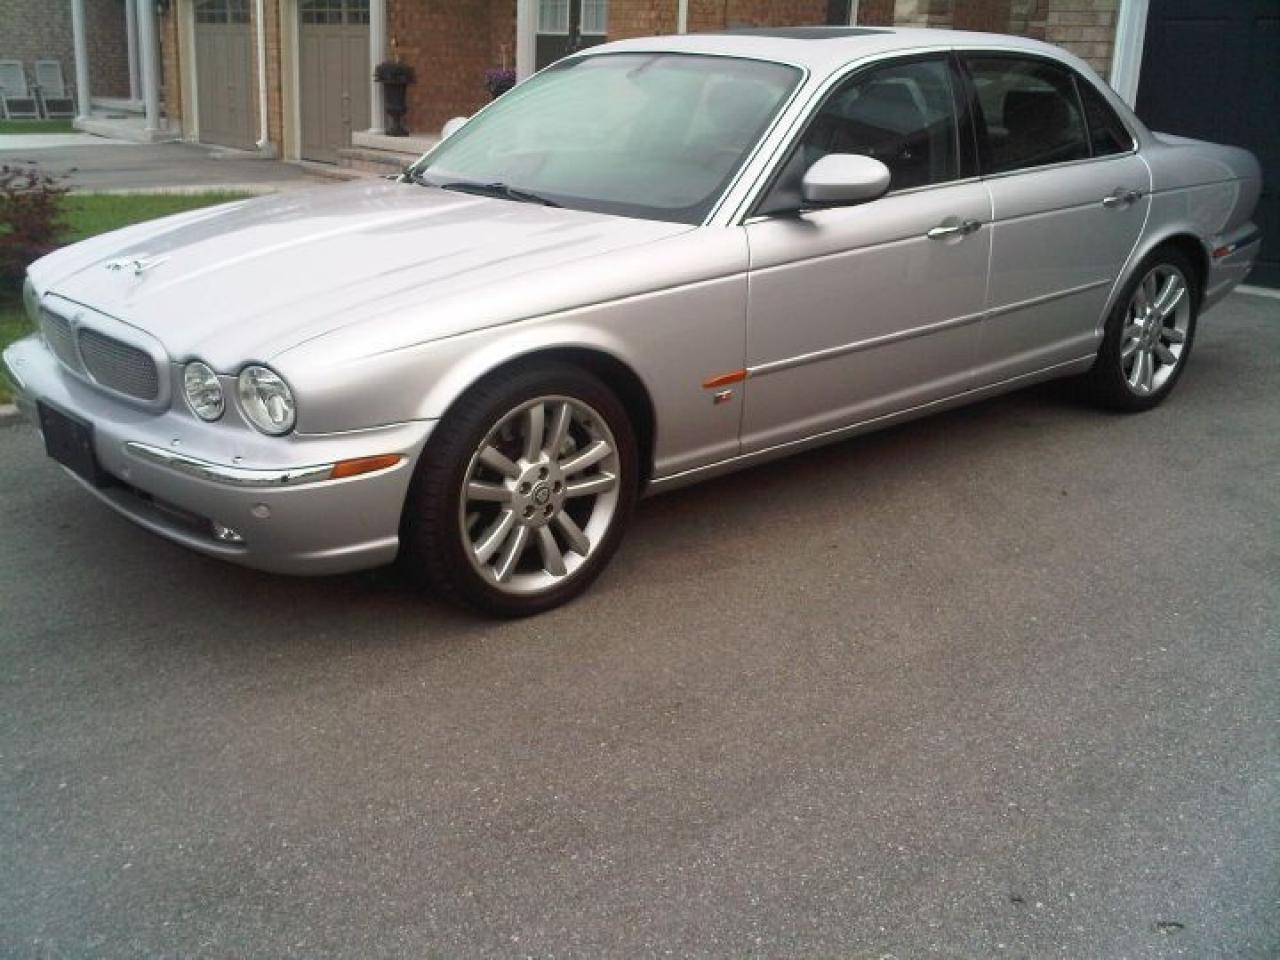 Photo of Silver 2004 Jaguar XJR